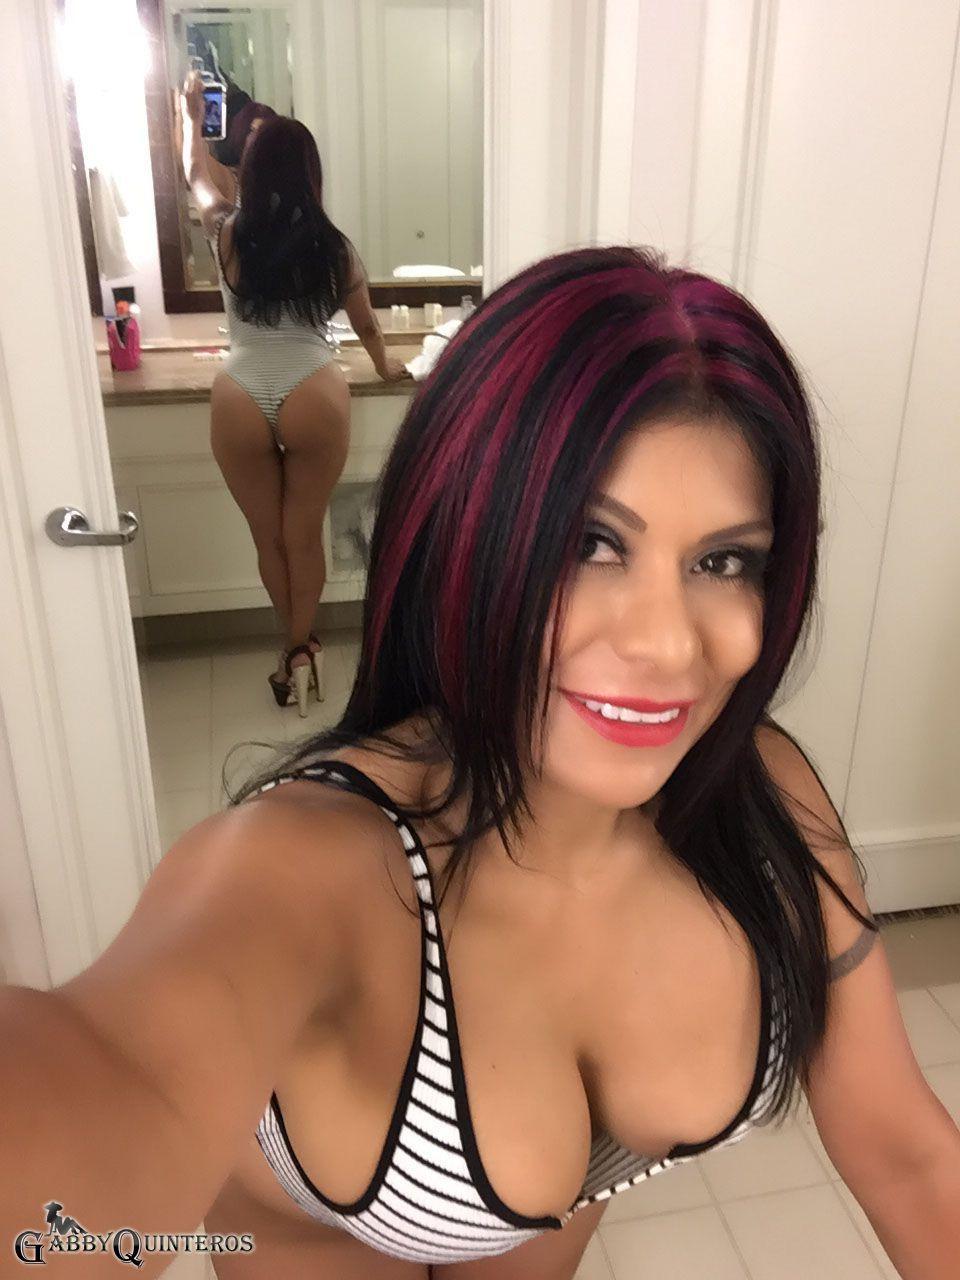 Gabby Quinteros